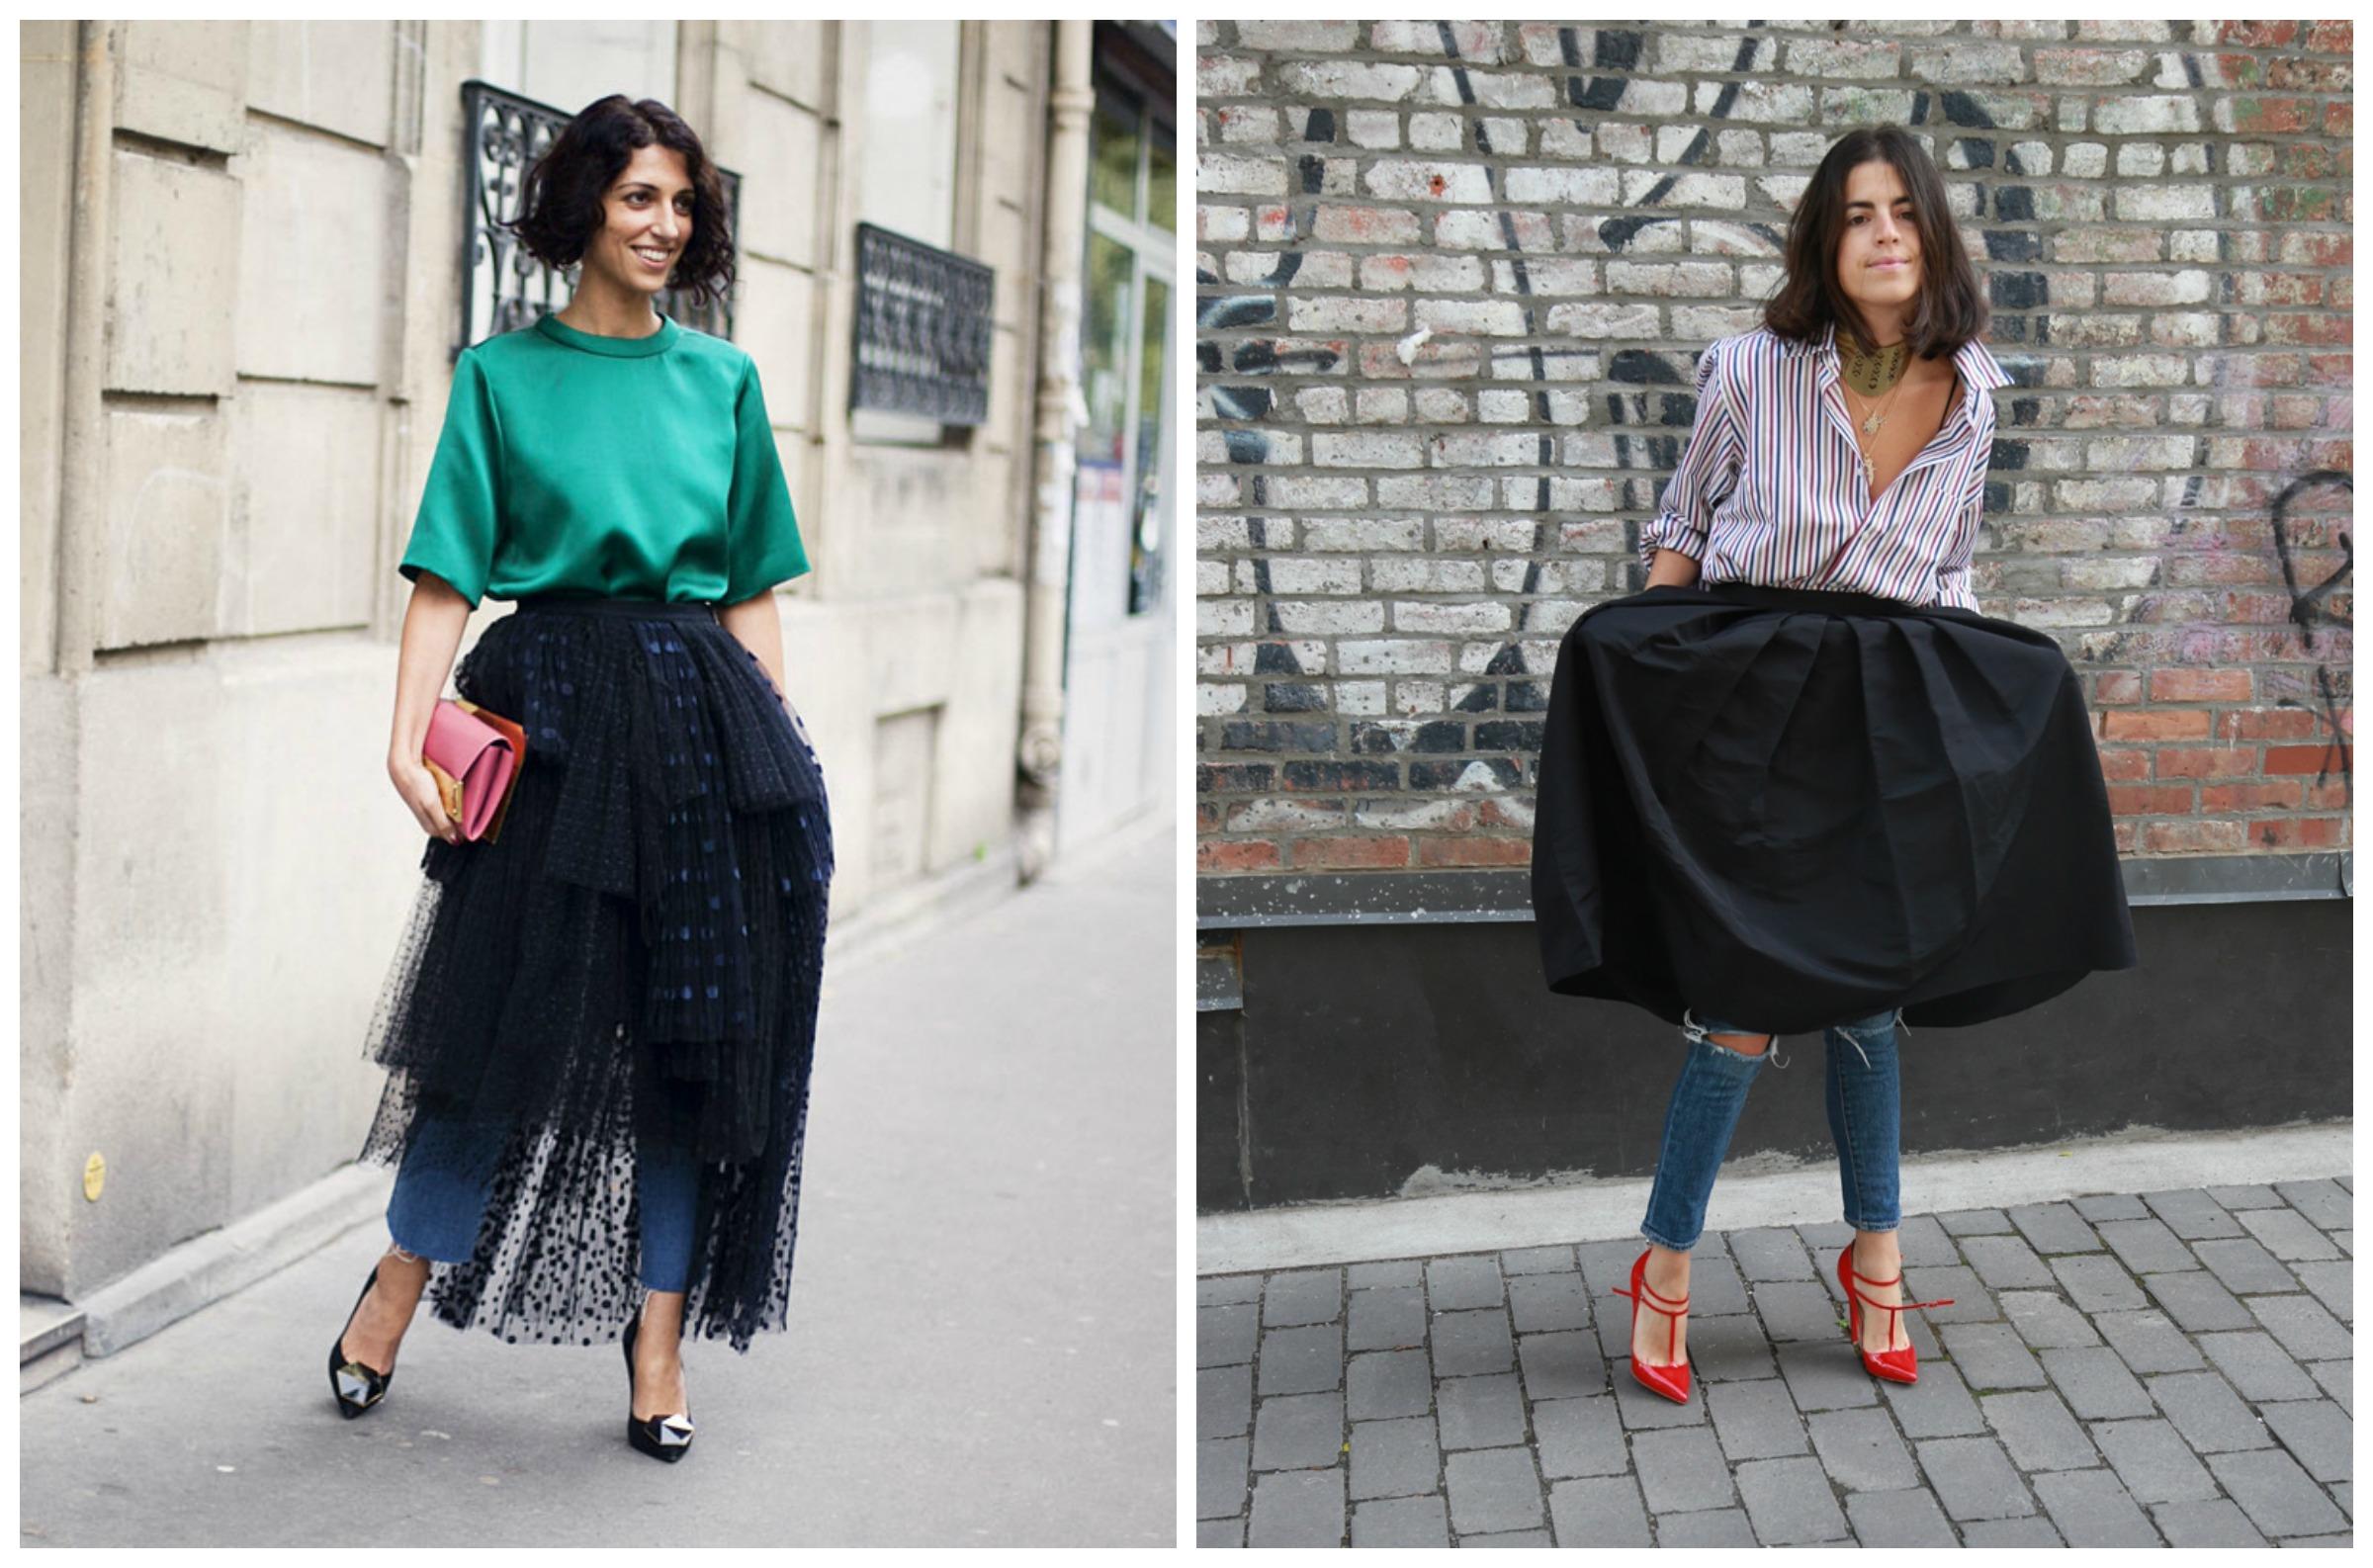 Skirt Or Jeans Both Sleep Eat Wear